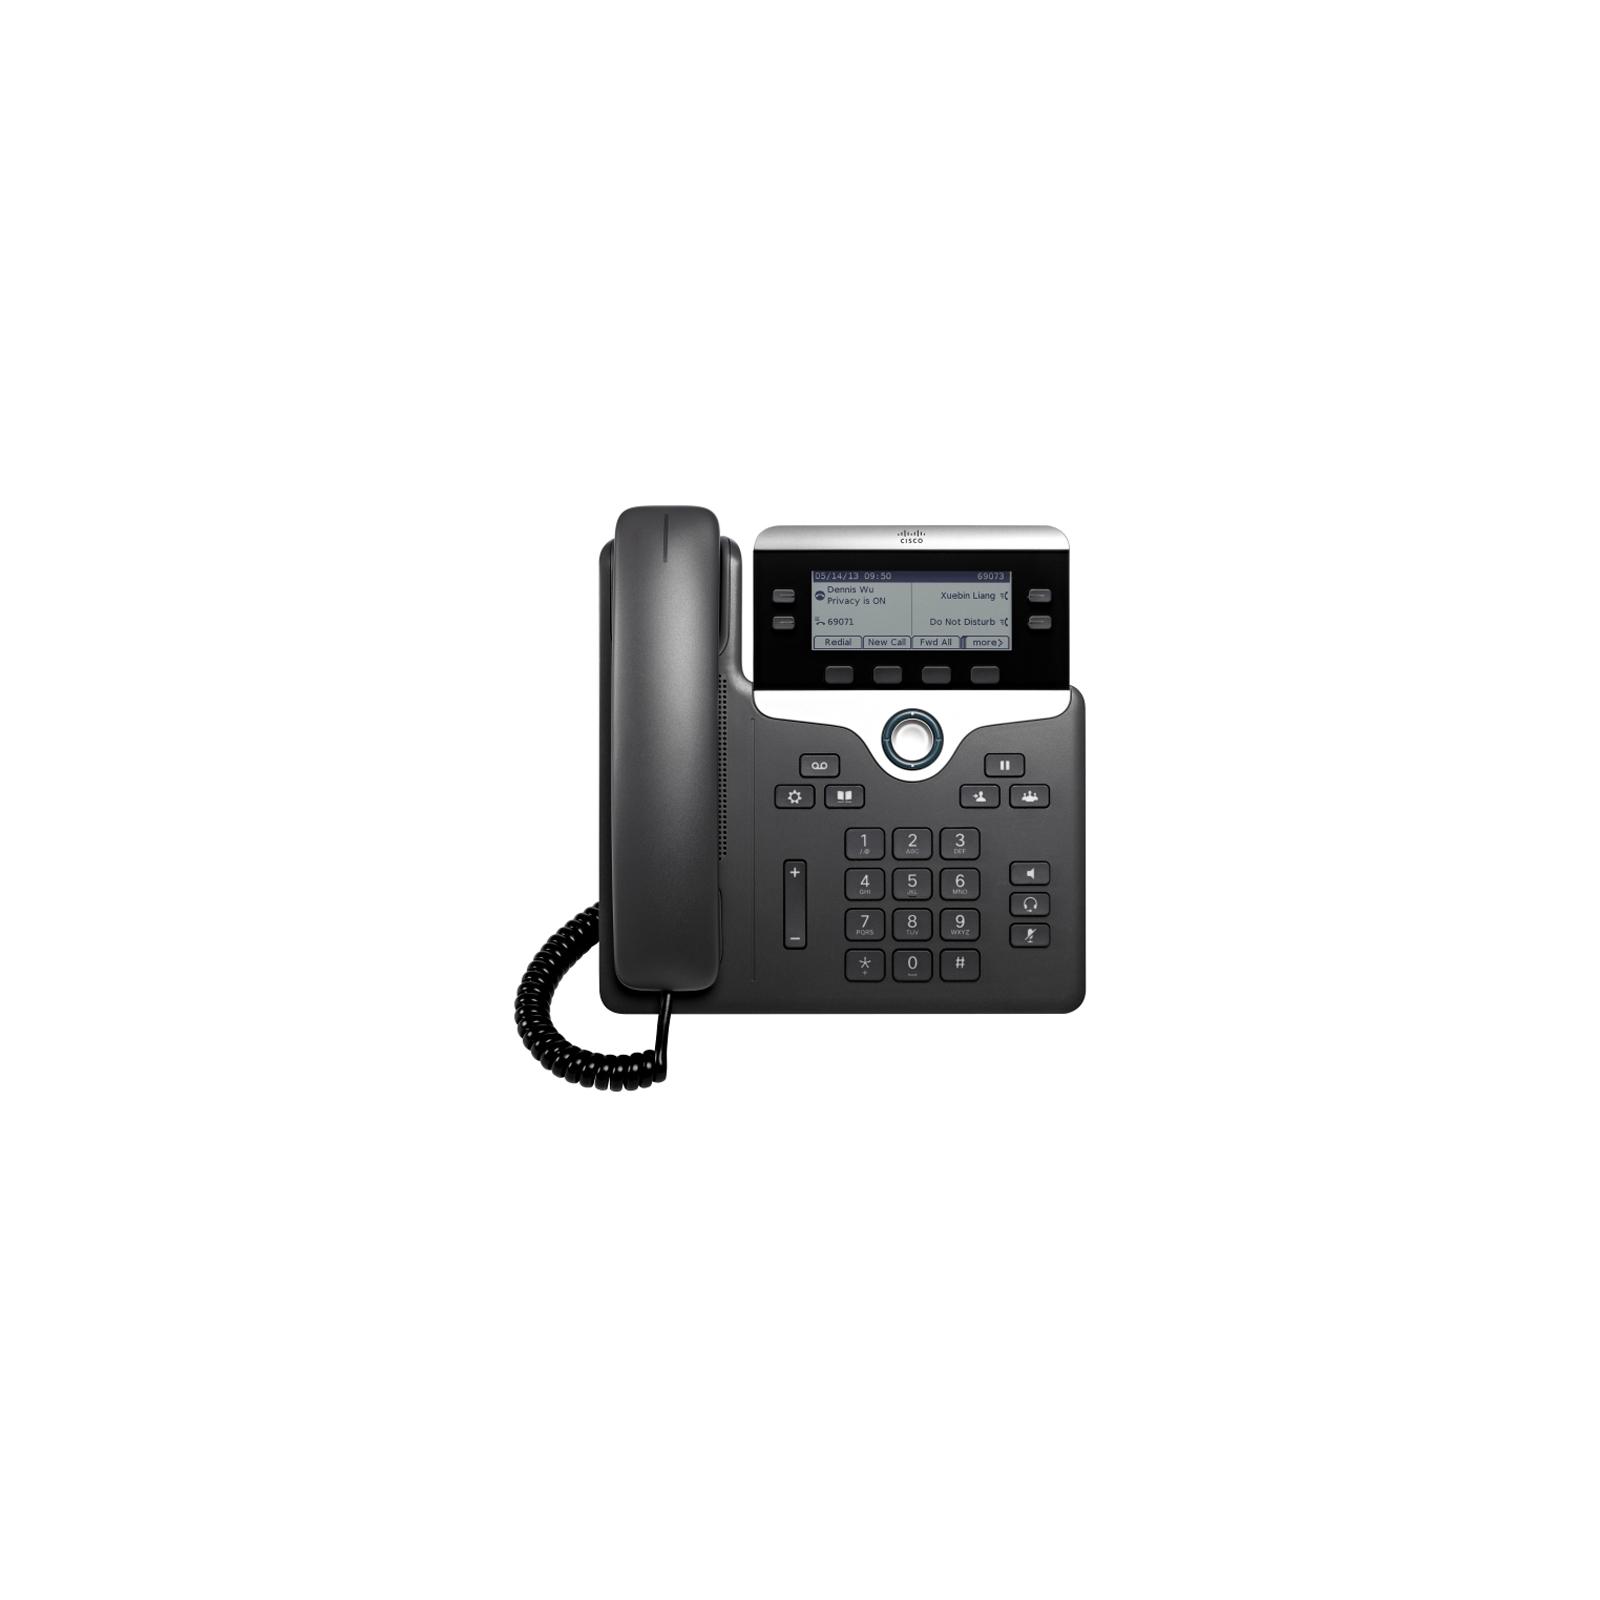 IP телефон Cisco SNTC-8X5XNBD (con-snt-cp7821k9) изображение 2